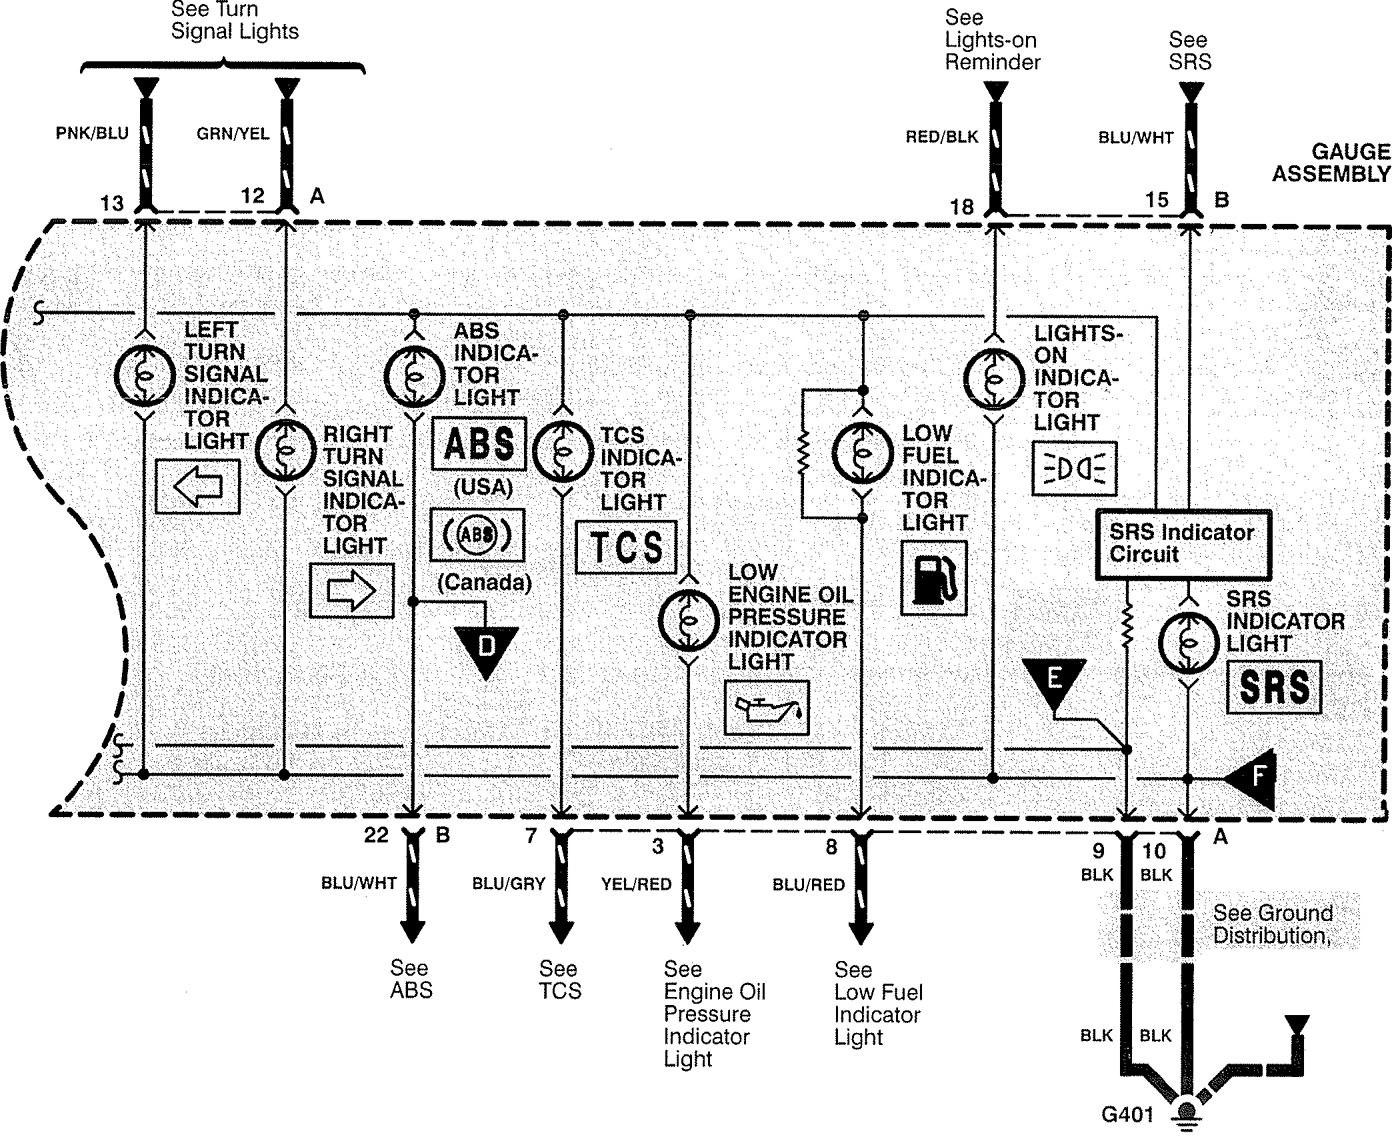 acura rl  1996  - wiring diagrams